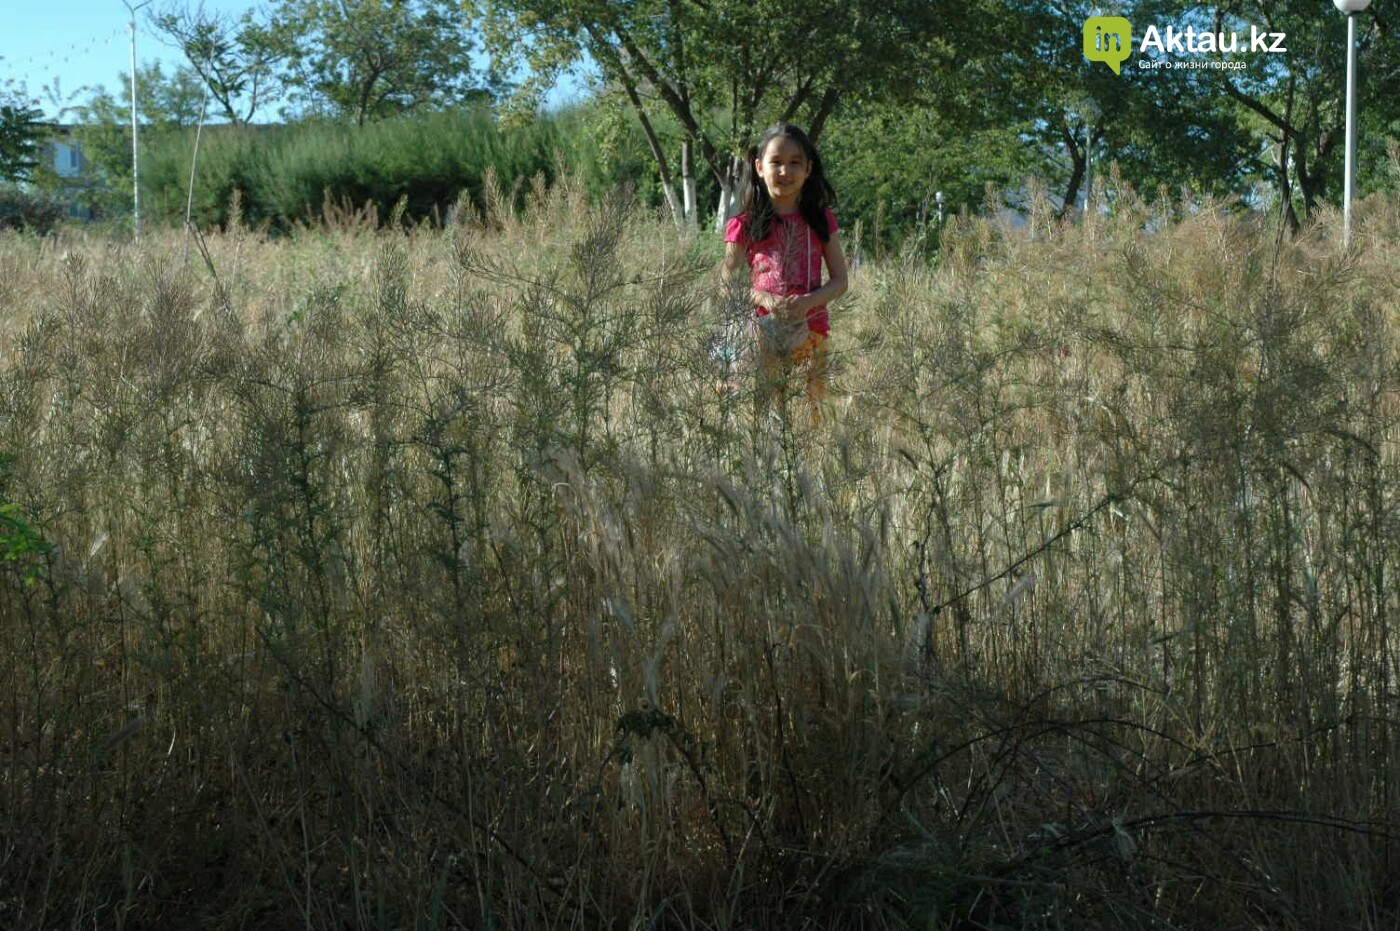 Погибшие от засухи и обезвоживания в Актау исчисляются десятками (ФОТО), фото-43